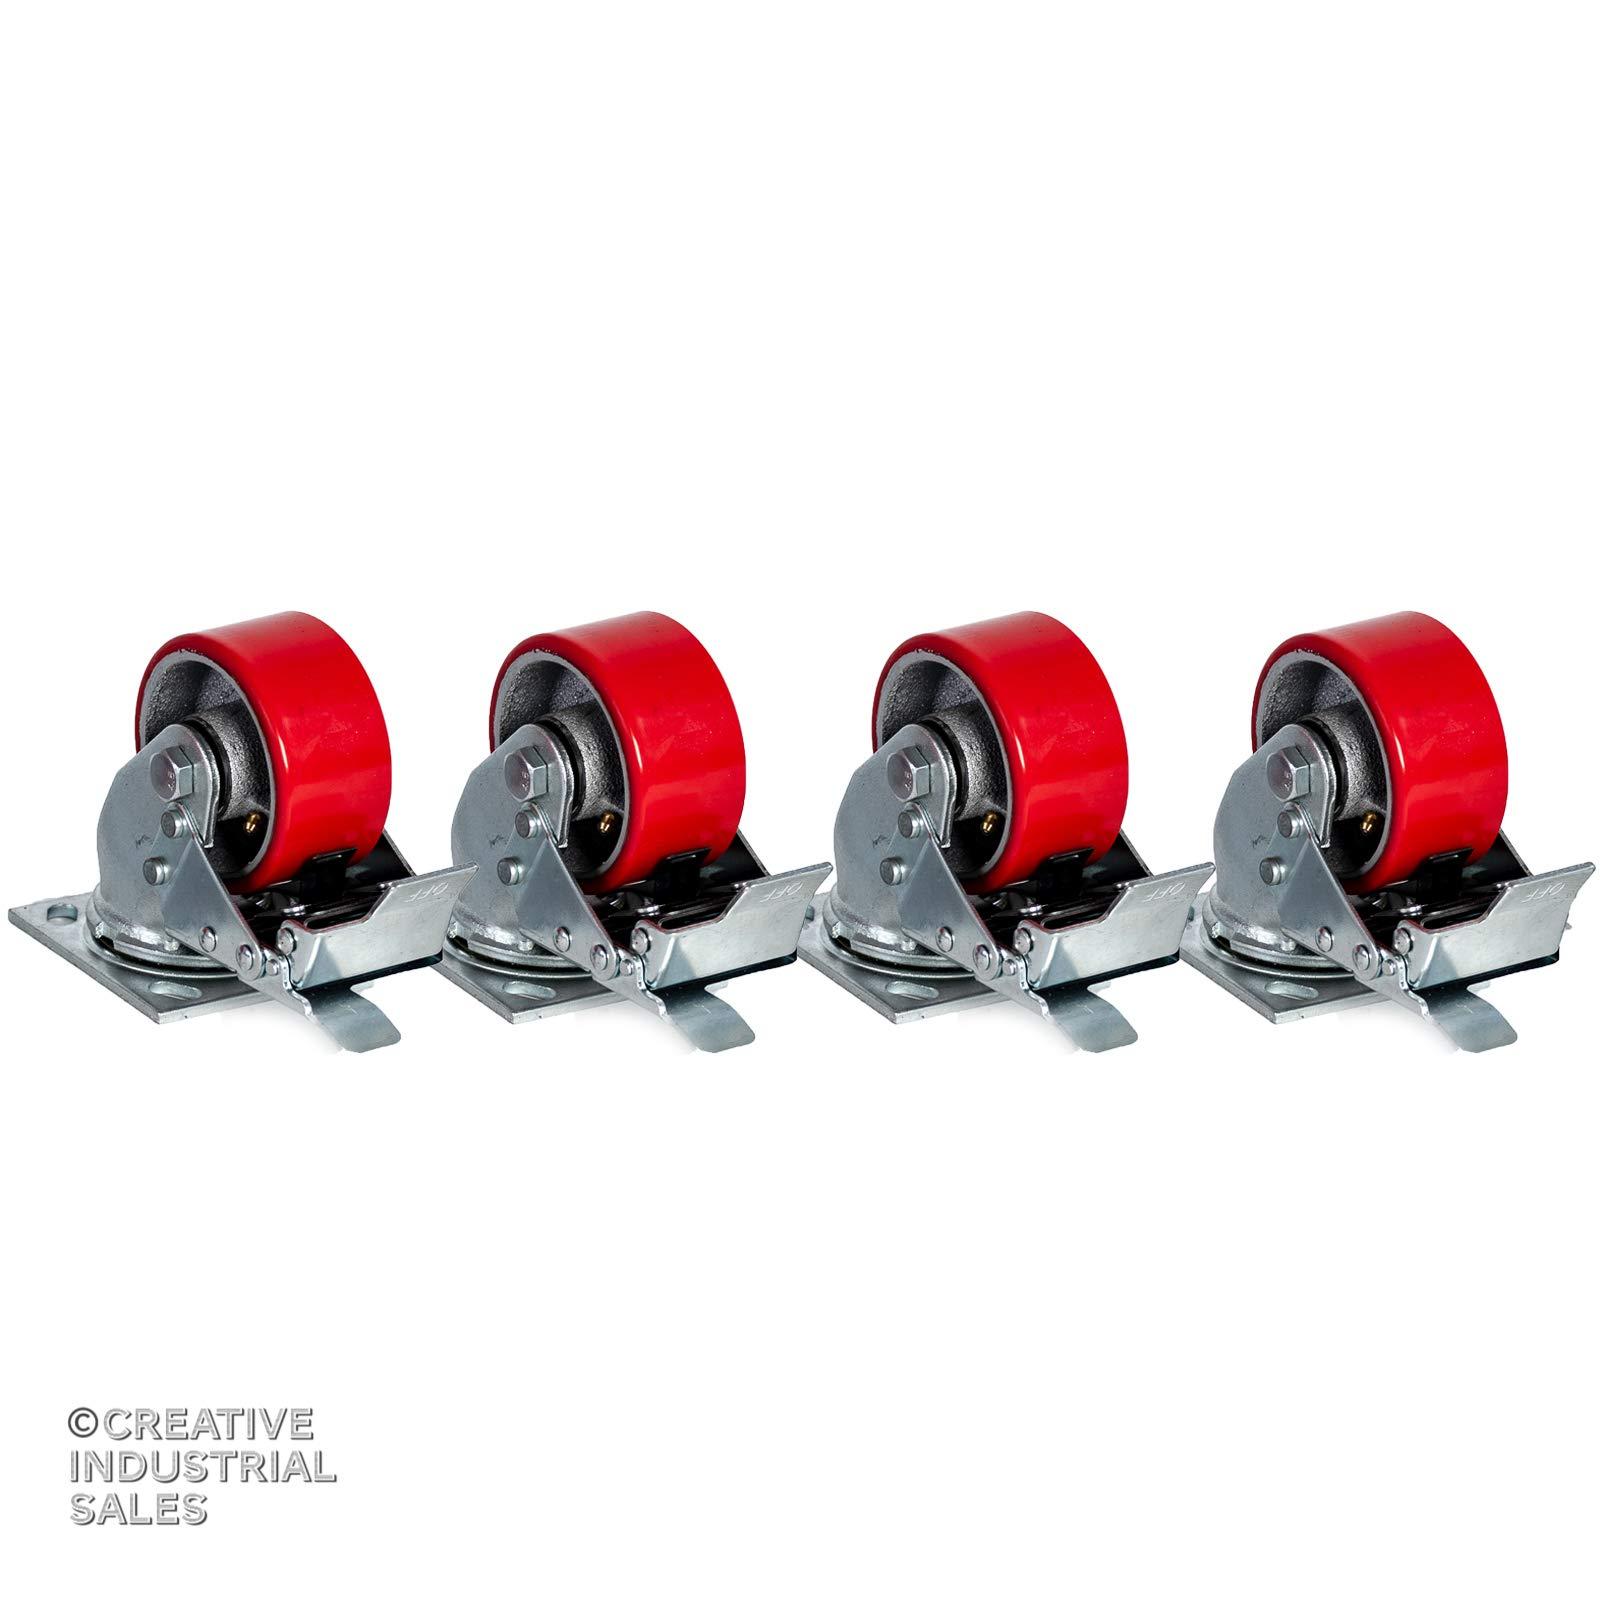 4'' x 2'' Swivel Casters Polyurethane Wheel w/Total Lock Brake 700lb ea (4) Toolbox